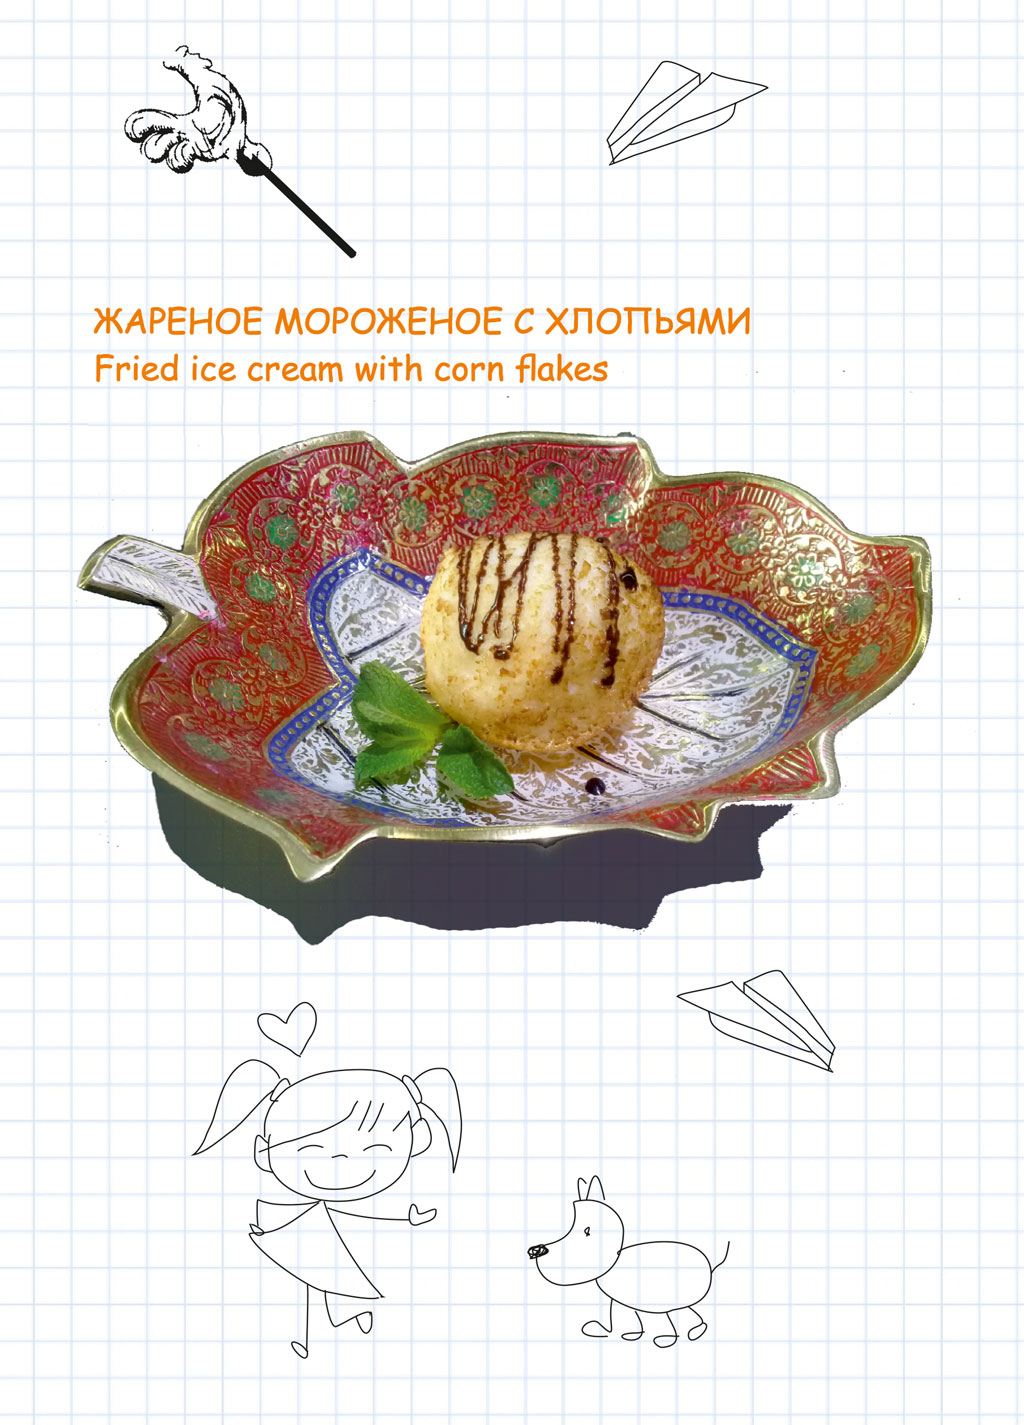 Жареное мороженое с хлопьями (Fried ice cream with corn flakes) в ресторане Аннам Брахма в Оренбурге